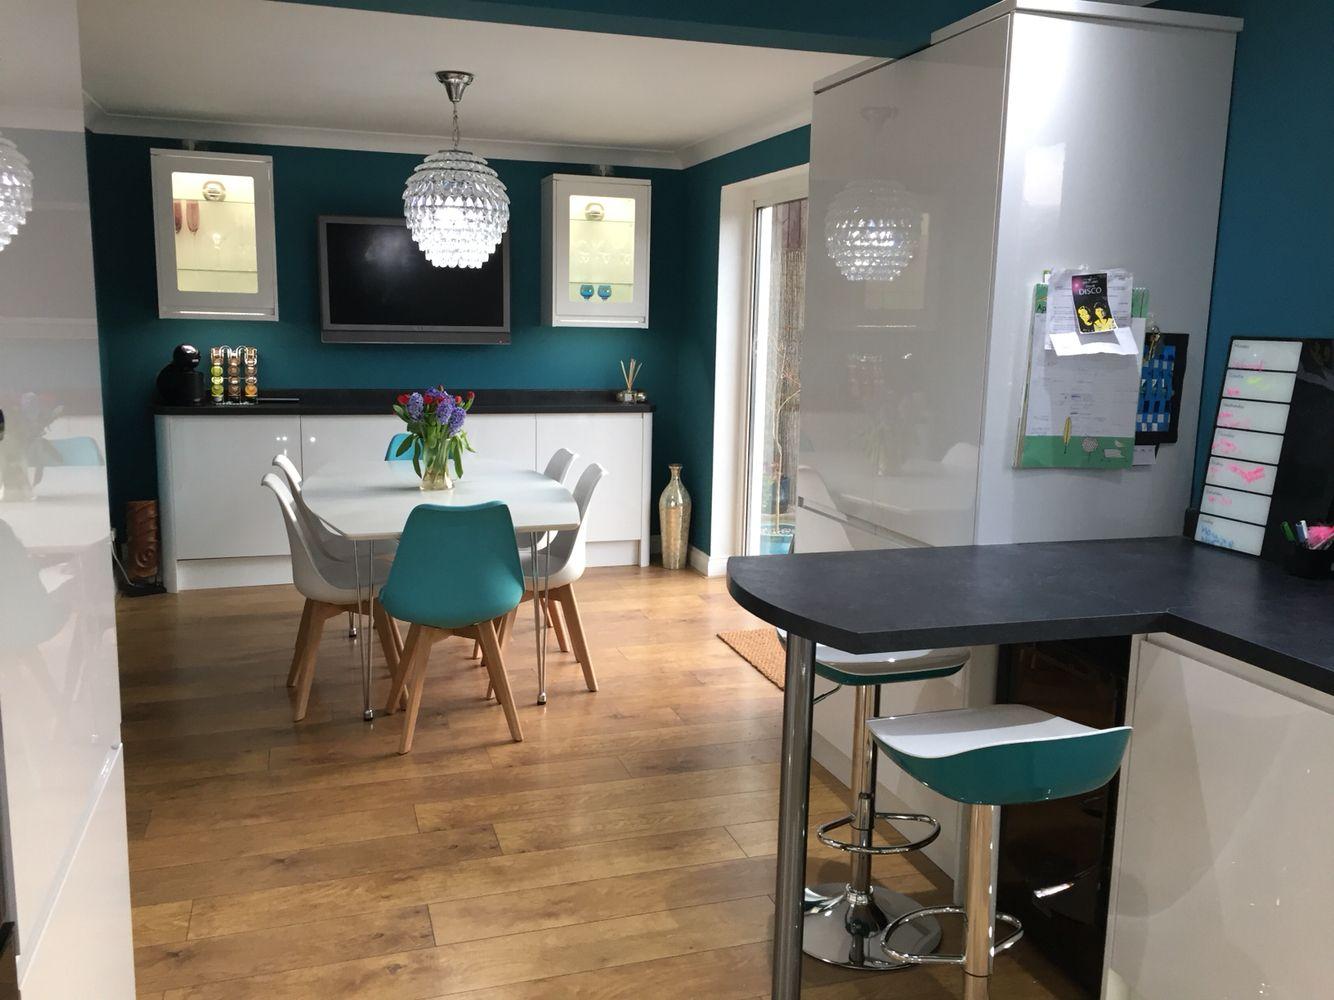 Best Howdens White Gloss Kitchen Vardo Farrow And Ball Walls 400 x 300